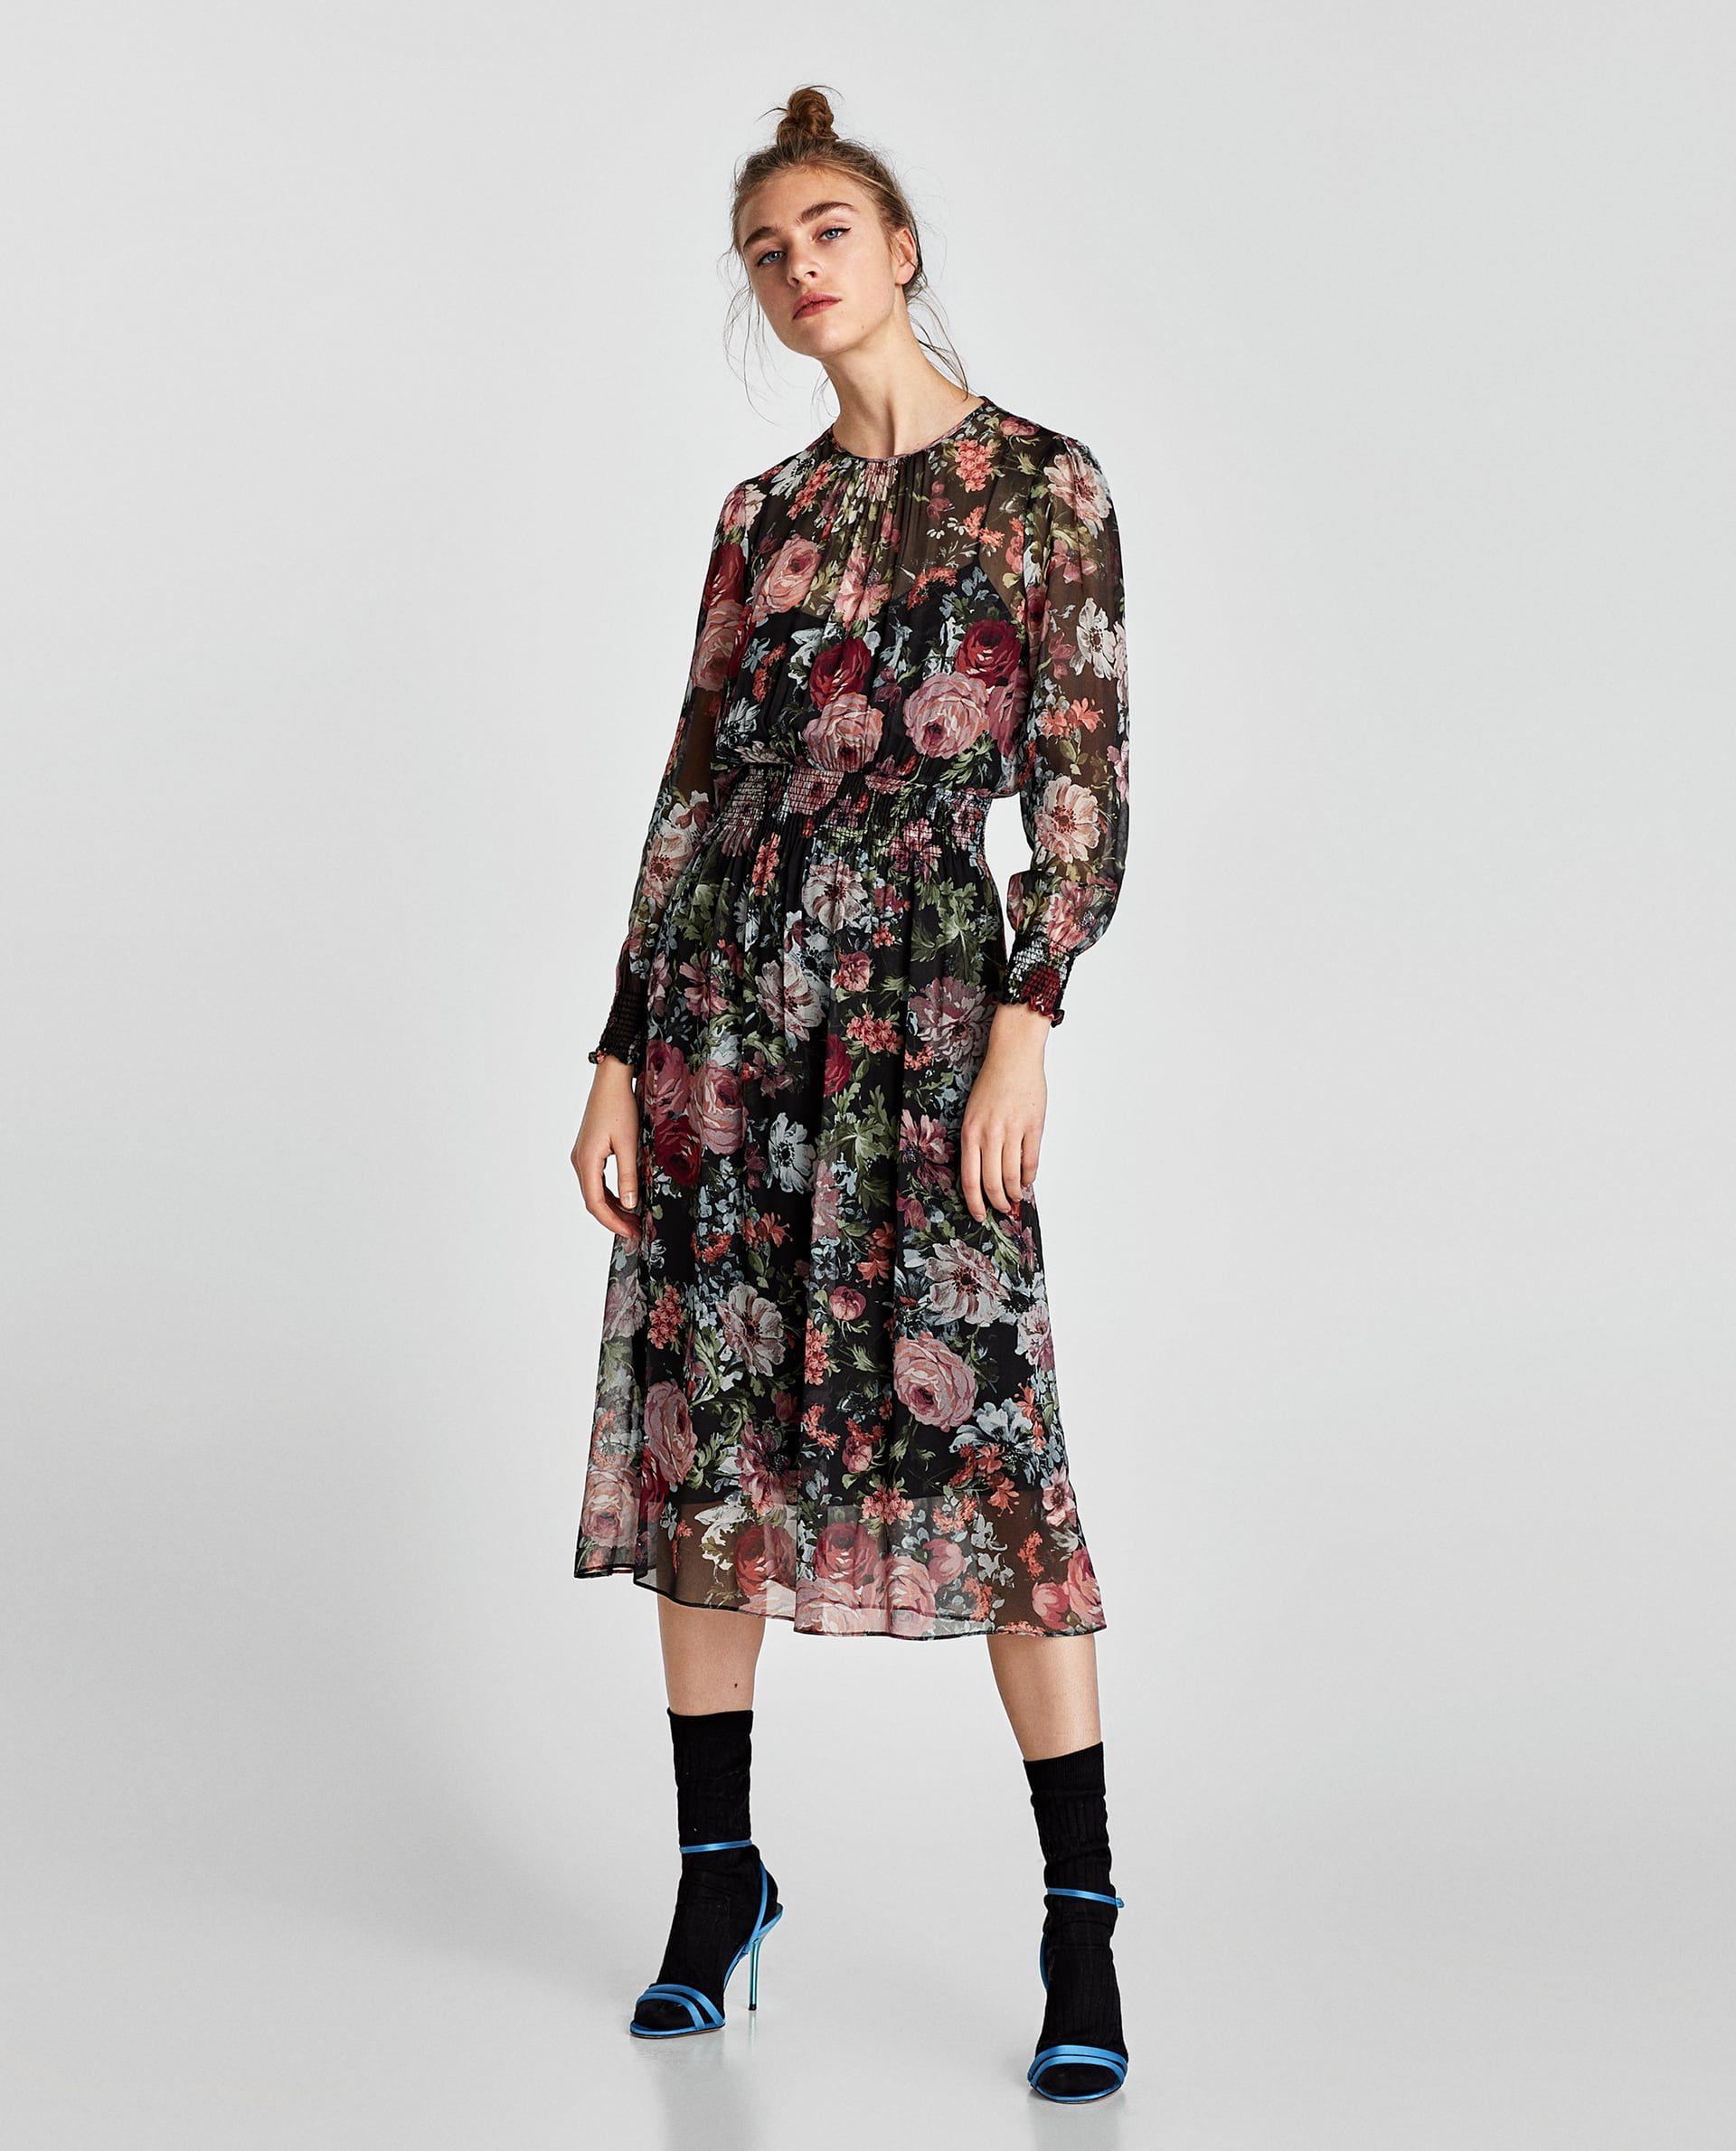 Vestido Midi Estampado Winter Dress Outfits Midi Dress Winter Dresses